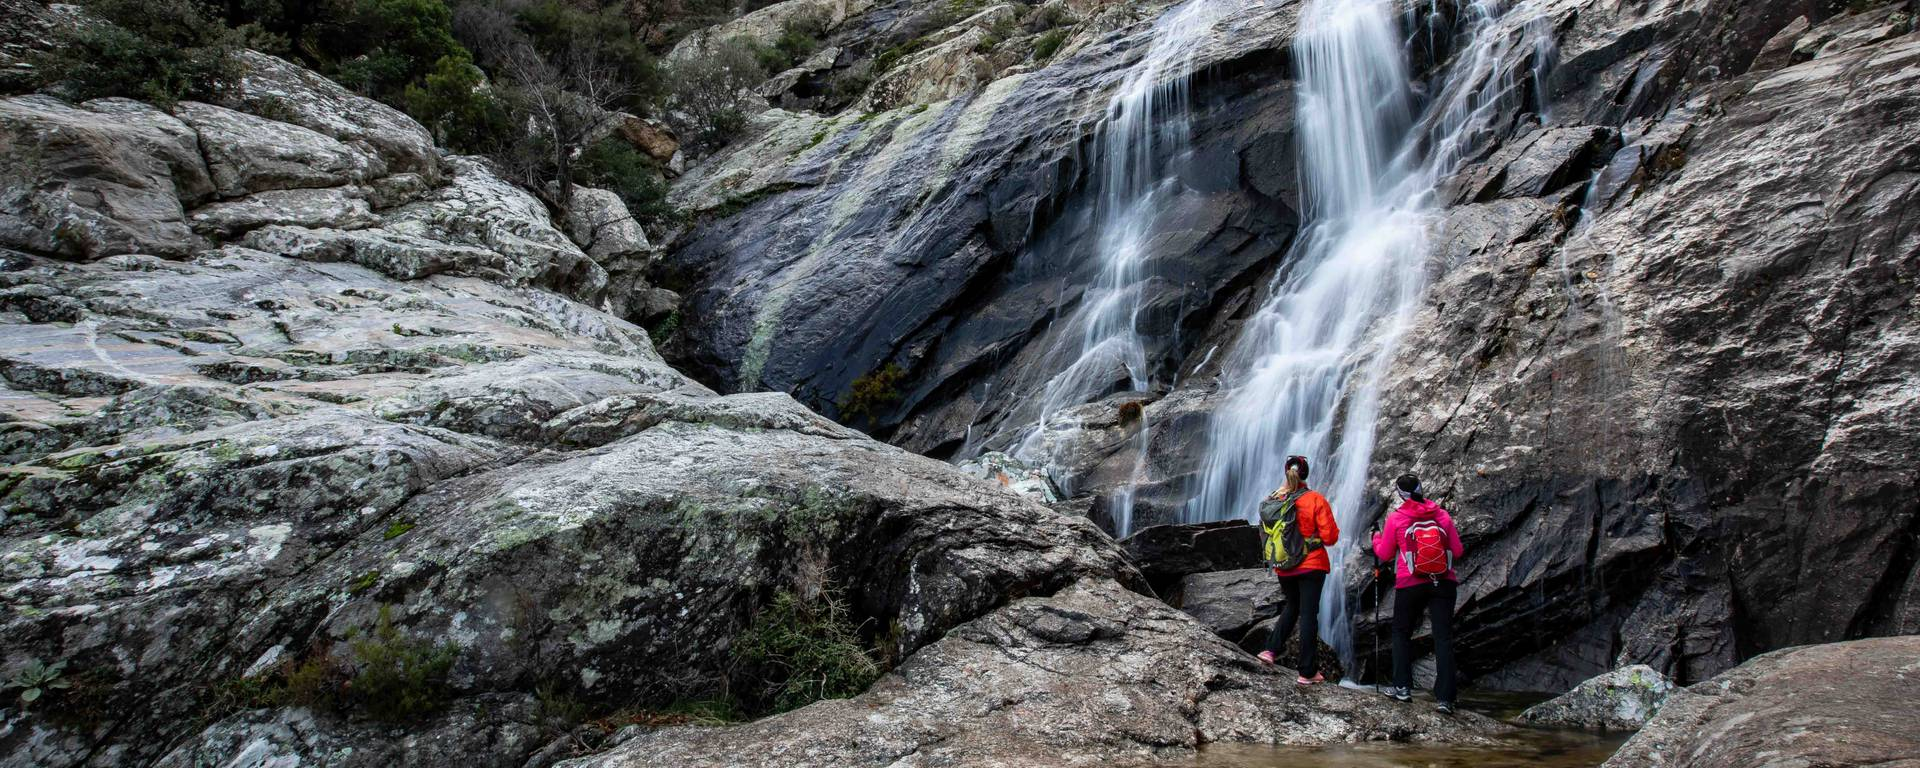 The Albine waterfall